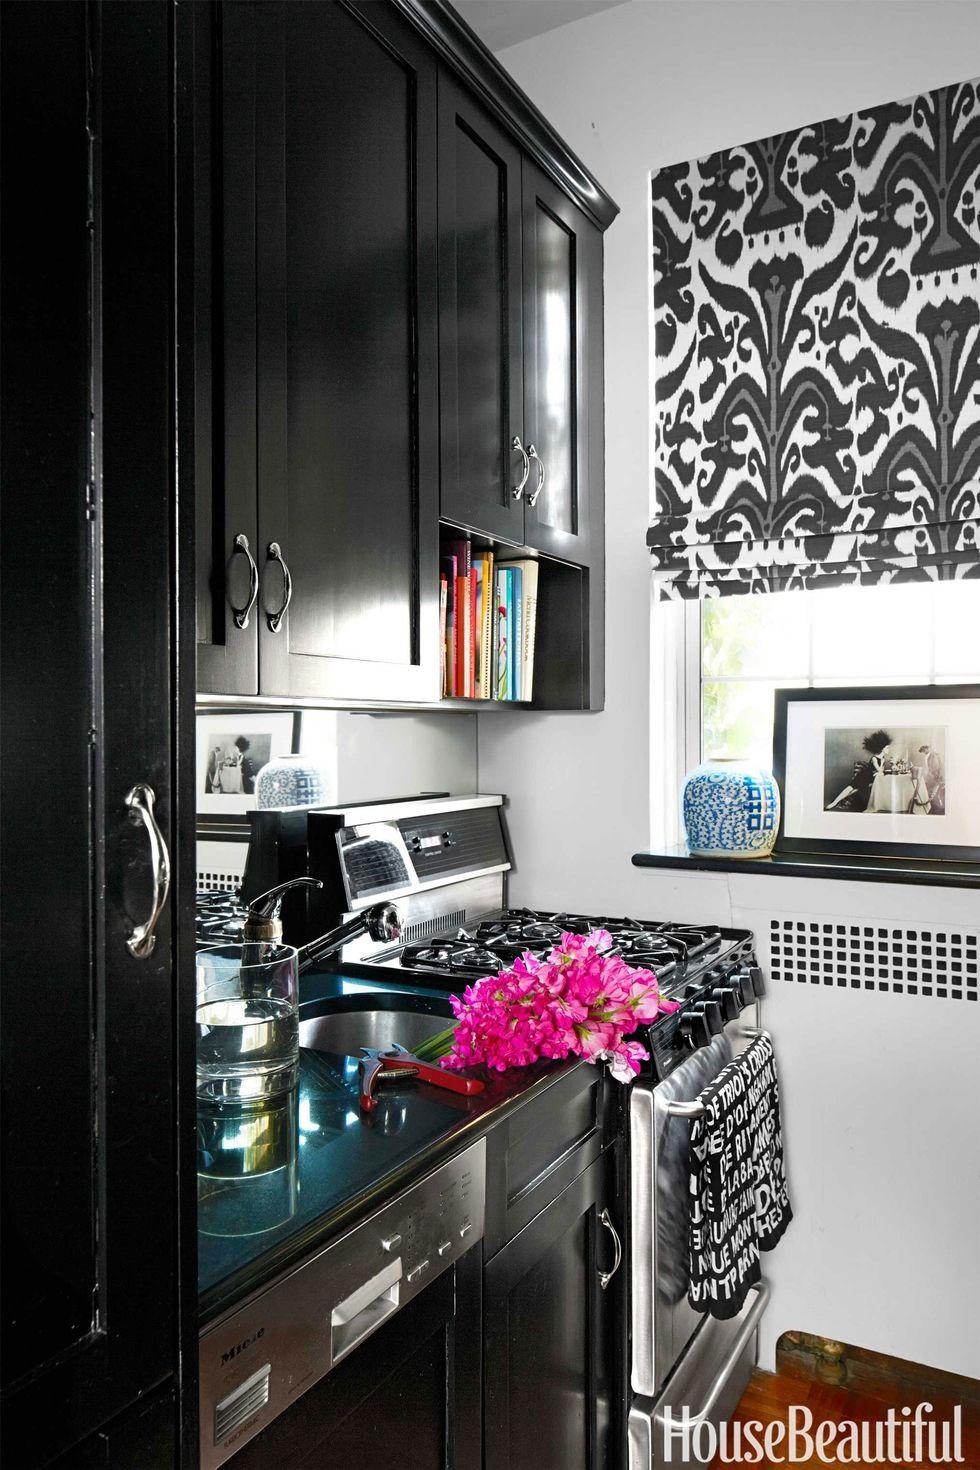 54c152faf06a4_-_05-hbx-black-kitchen-cabinets-bunn-0514-s2.jpg